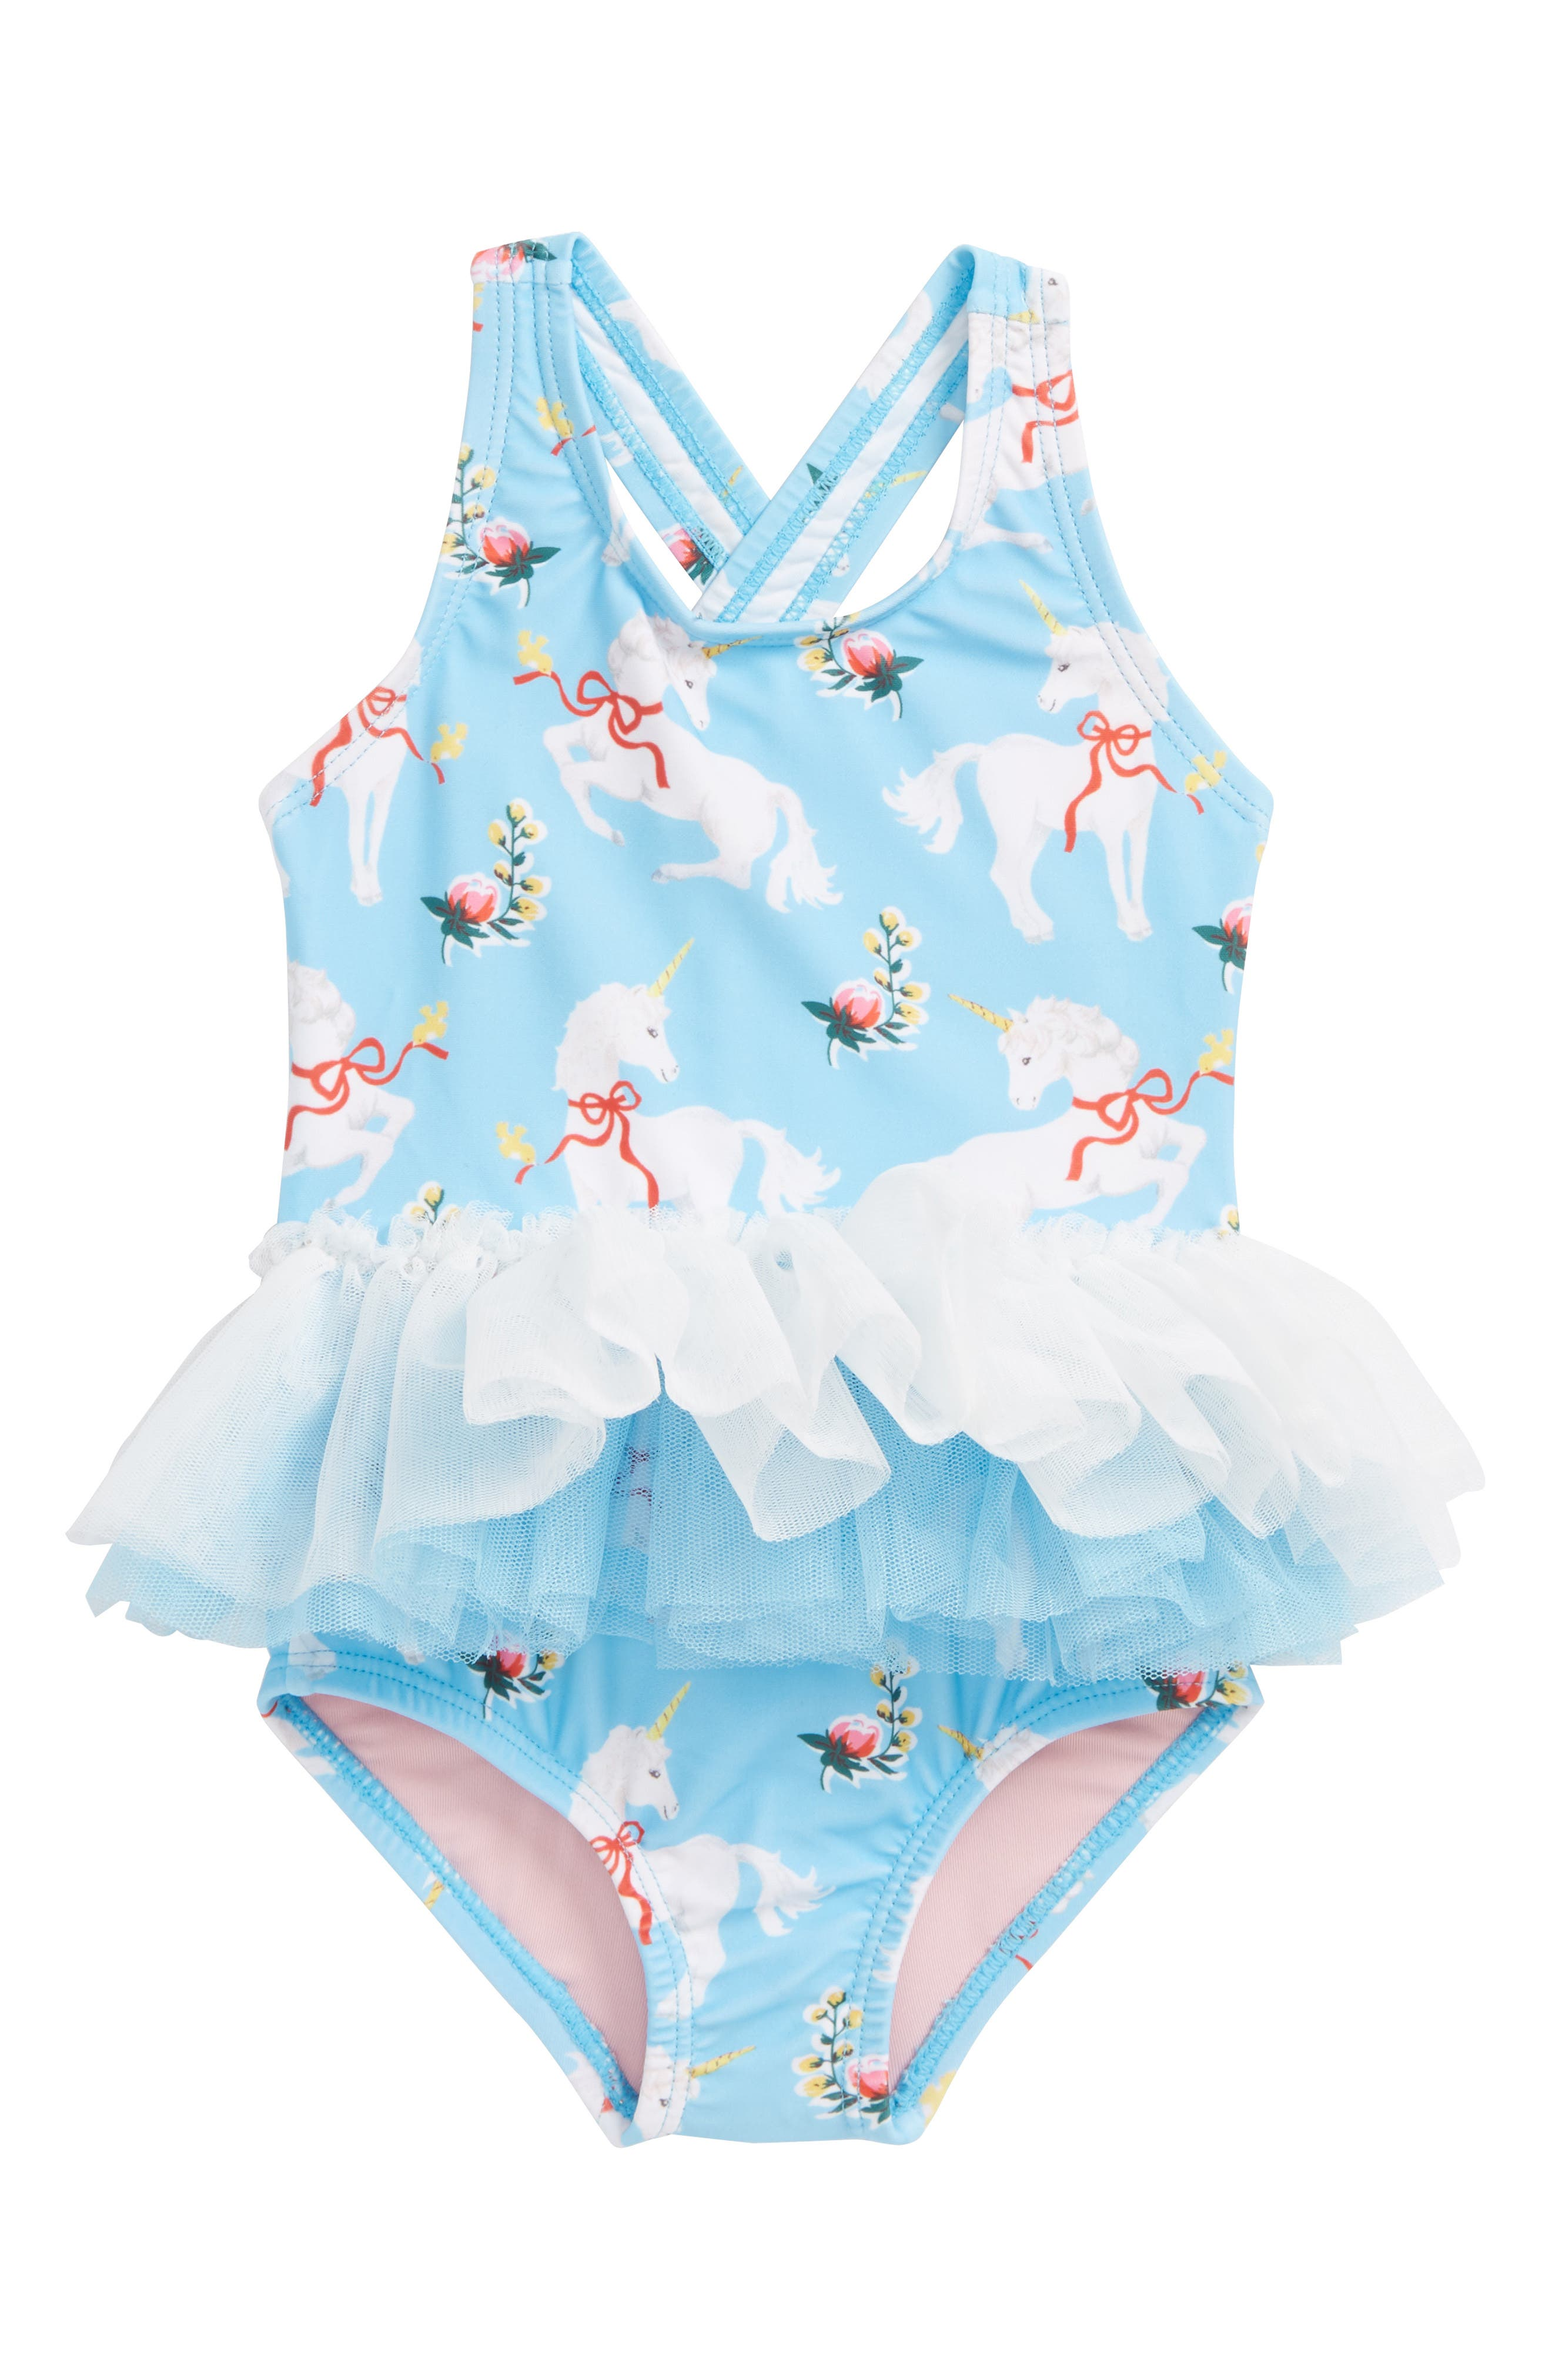 White Unicorns Tulle One-Piece Swimsuit,                             Main thumbnail 1, color,                             Blue